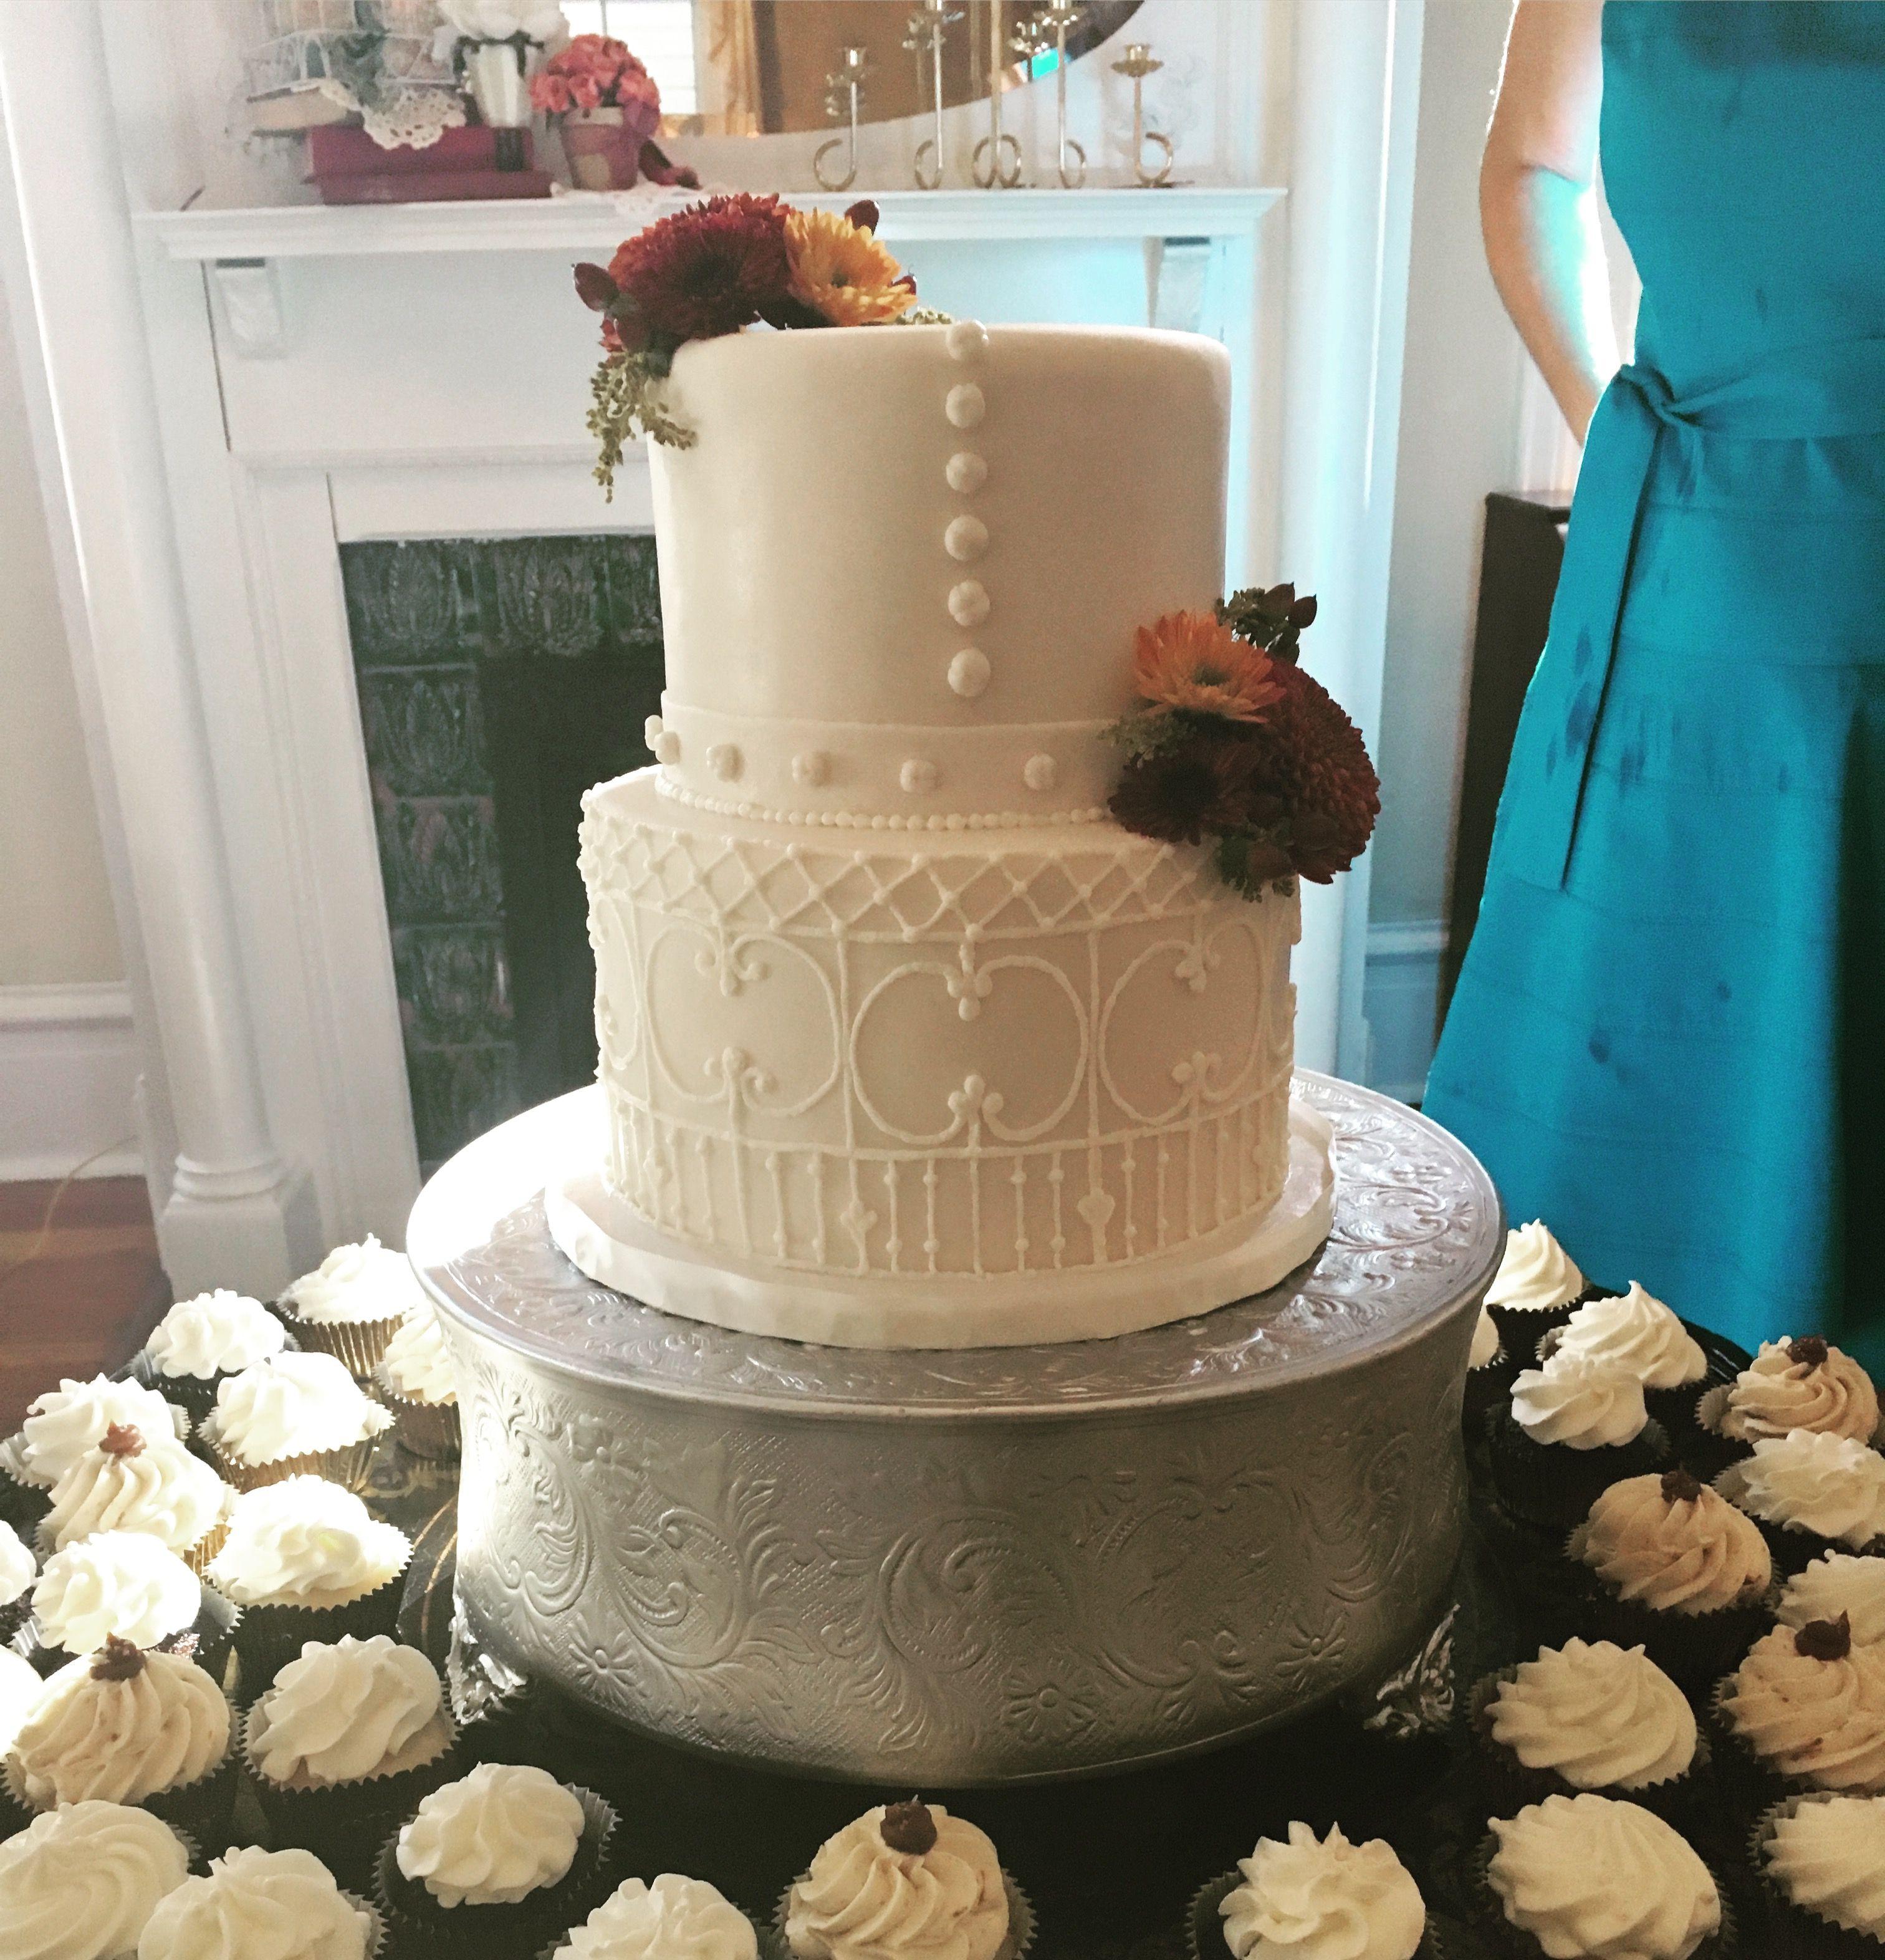 Great Gingerbread House In Savannah Ga Replica On A Wedding Cake Design Inspirations